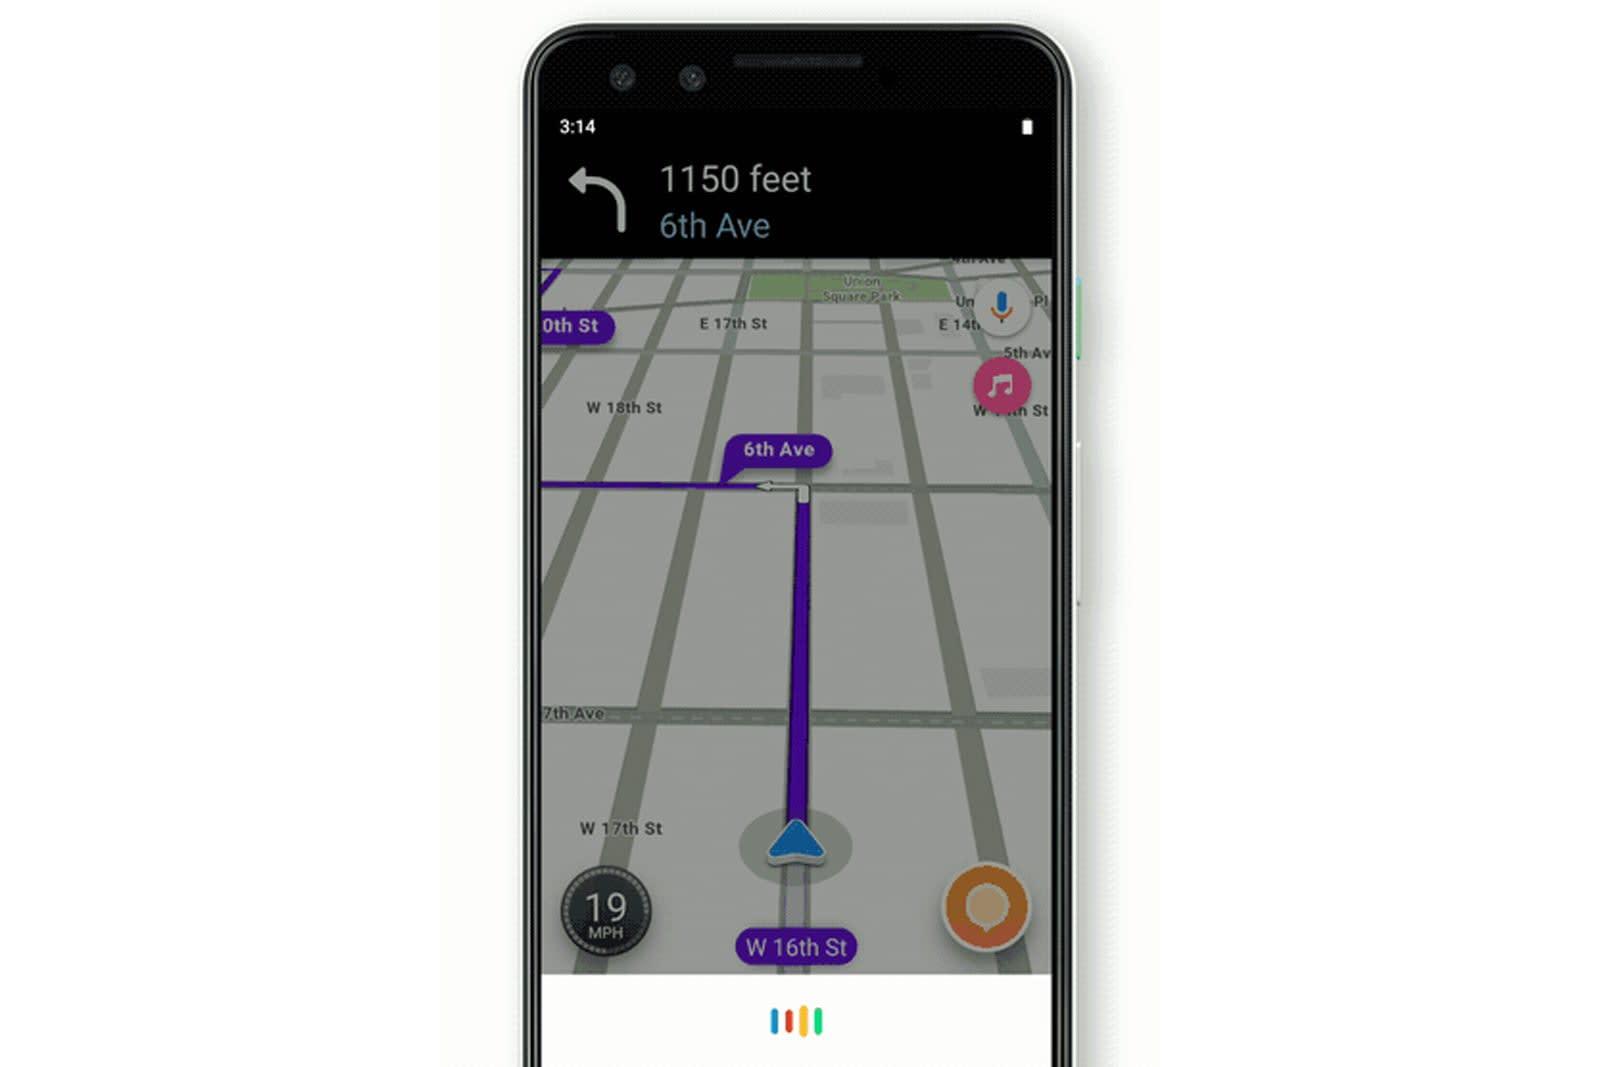 Google Assistant now offers navigation help in Waze